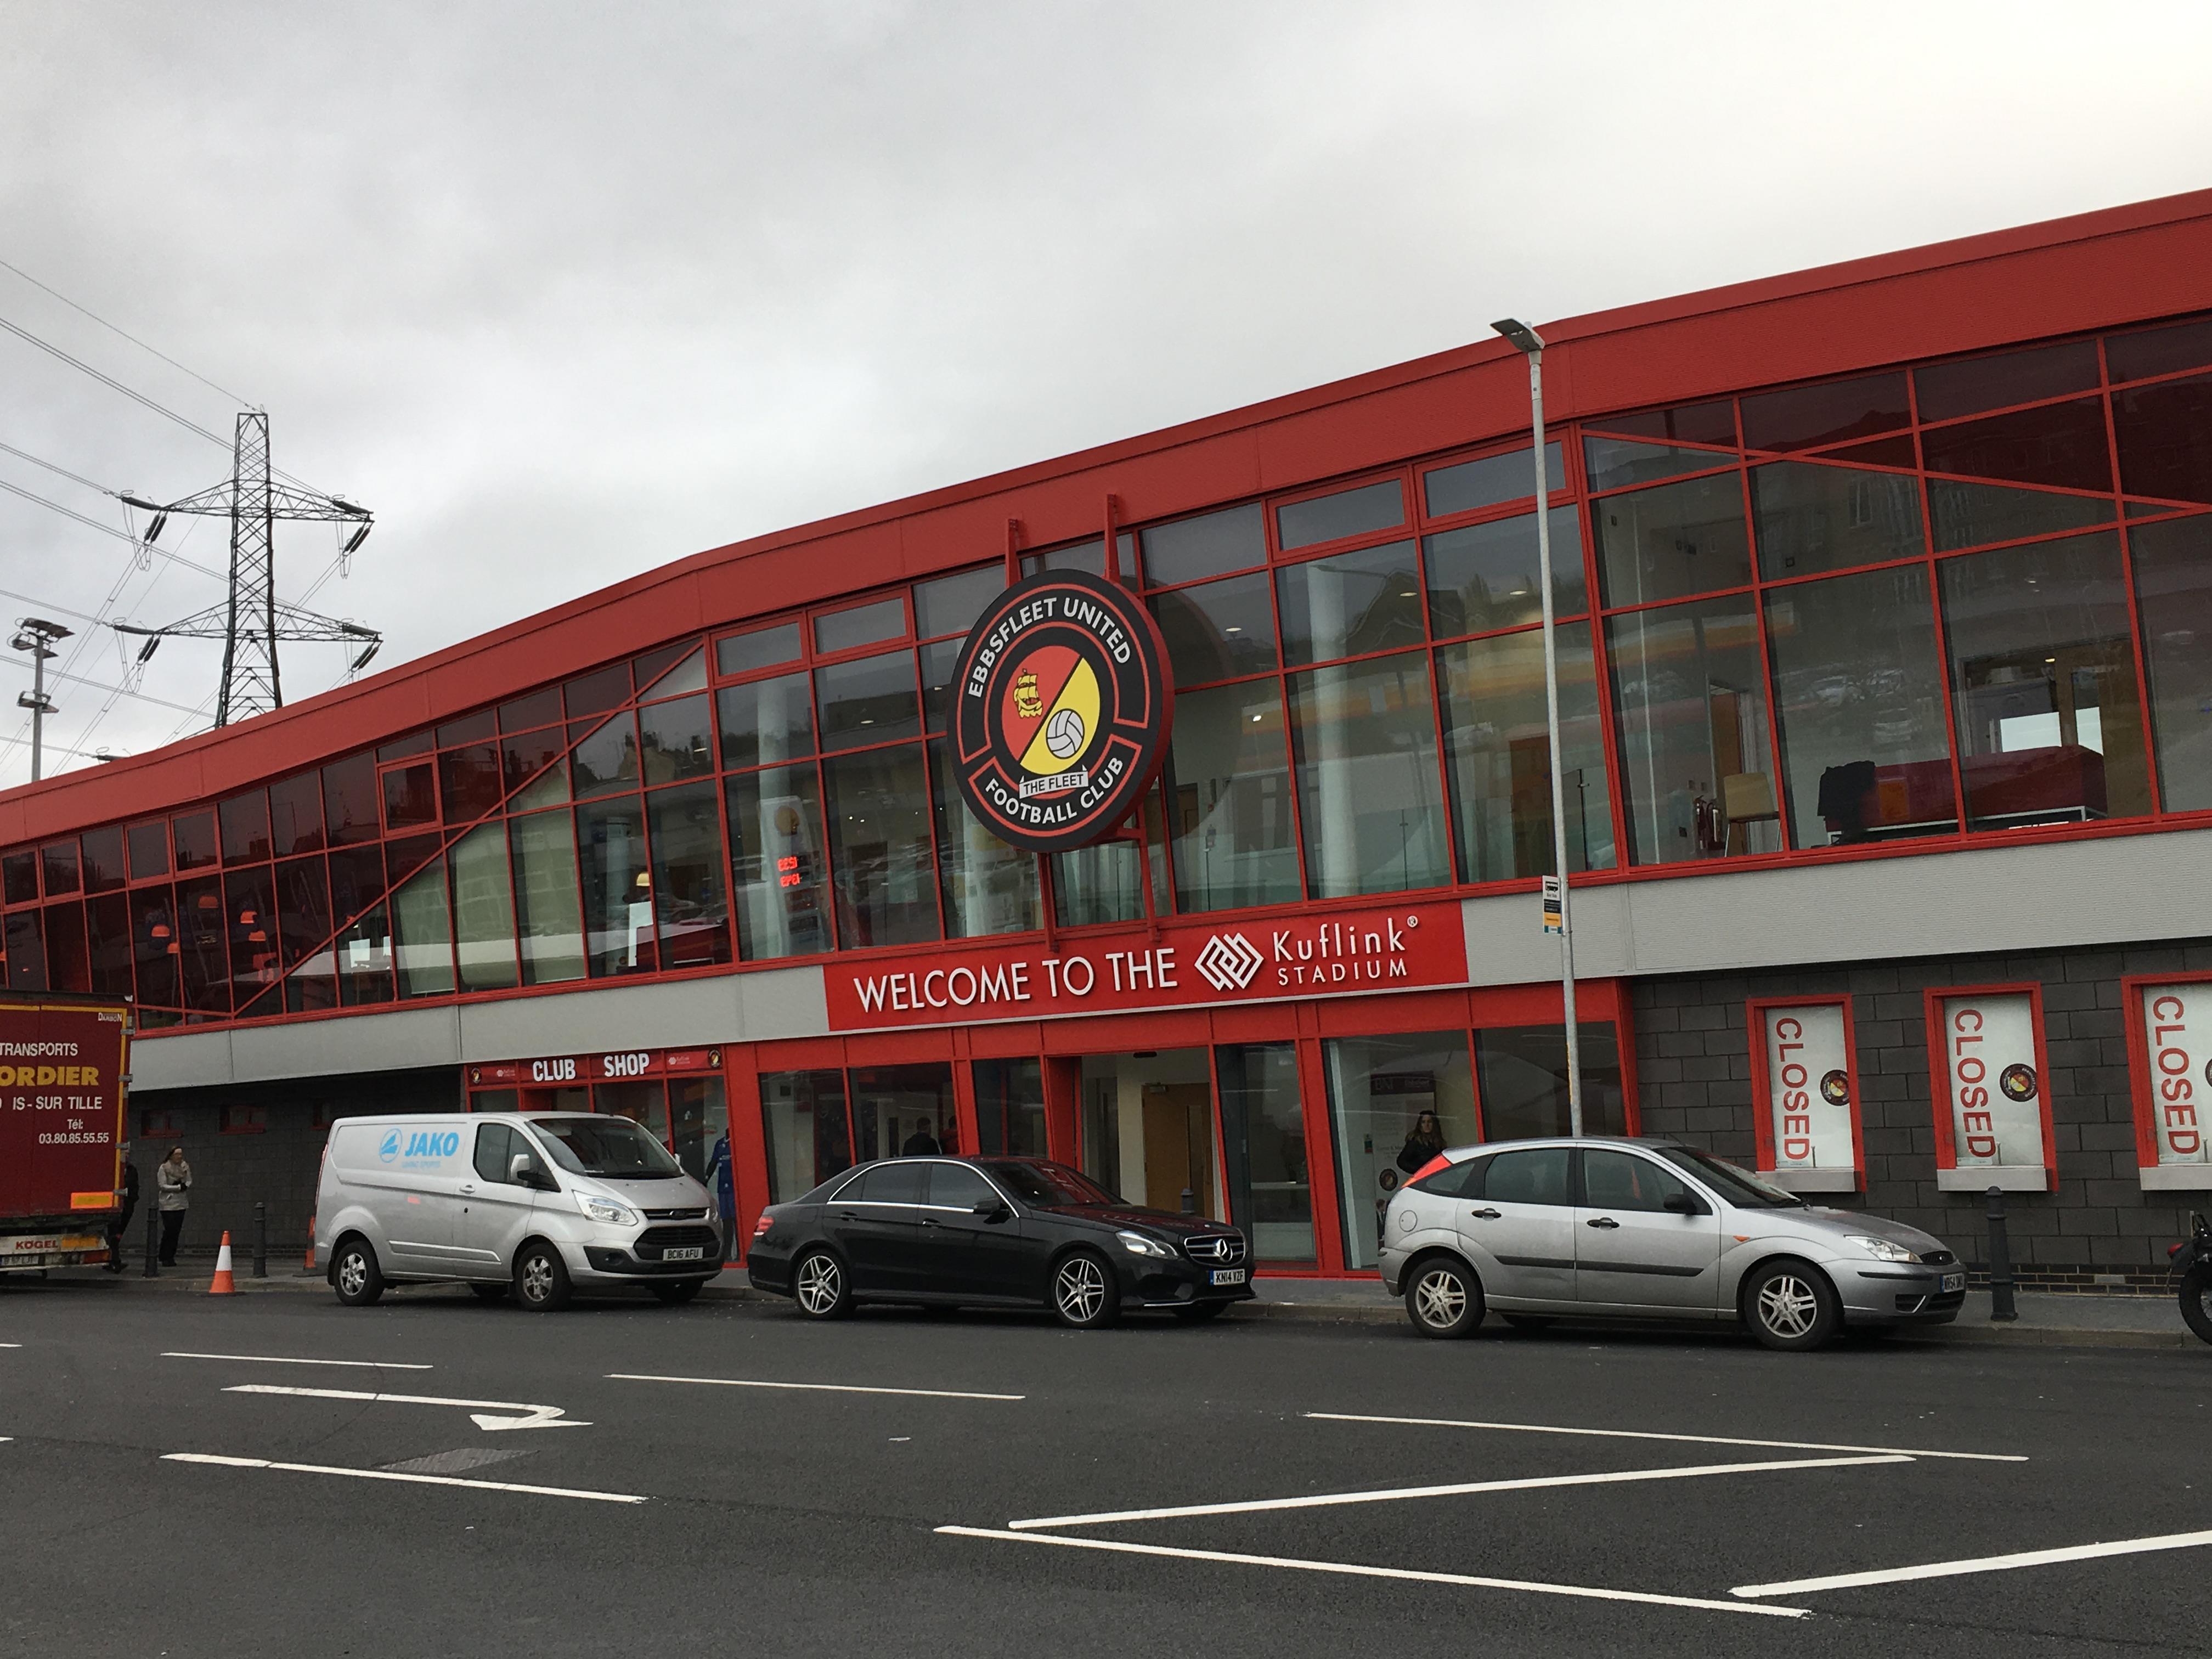 Ebbsfleet's new Stonebridge Road stand looks stunning from the outside